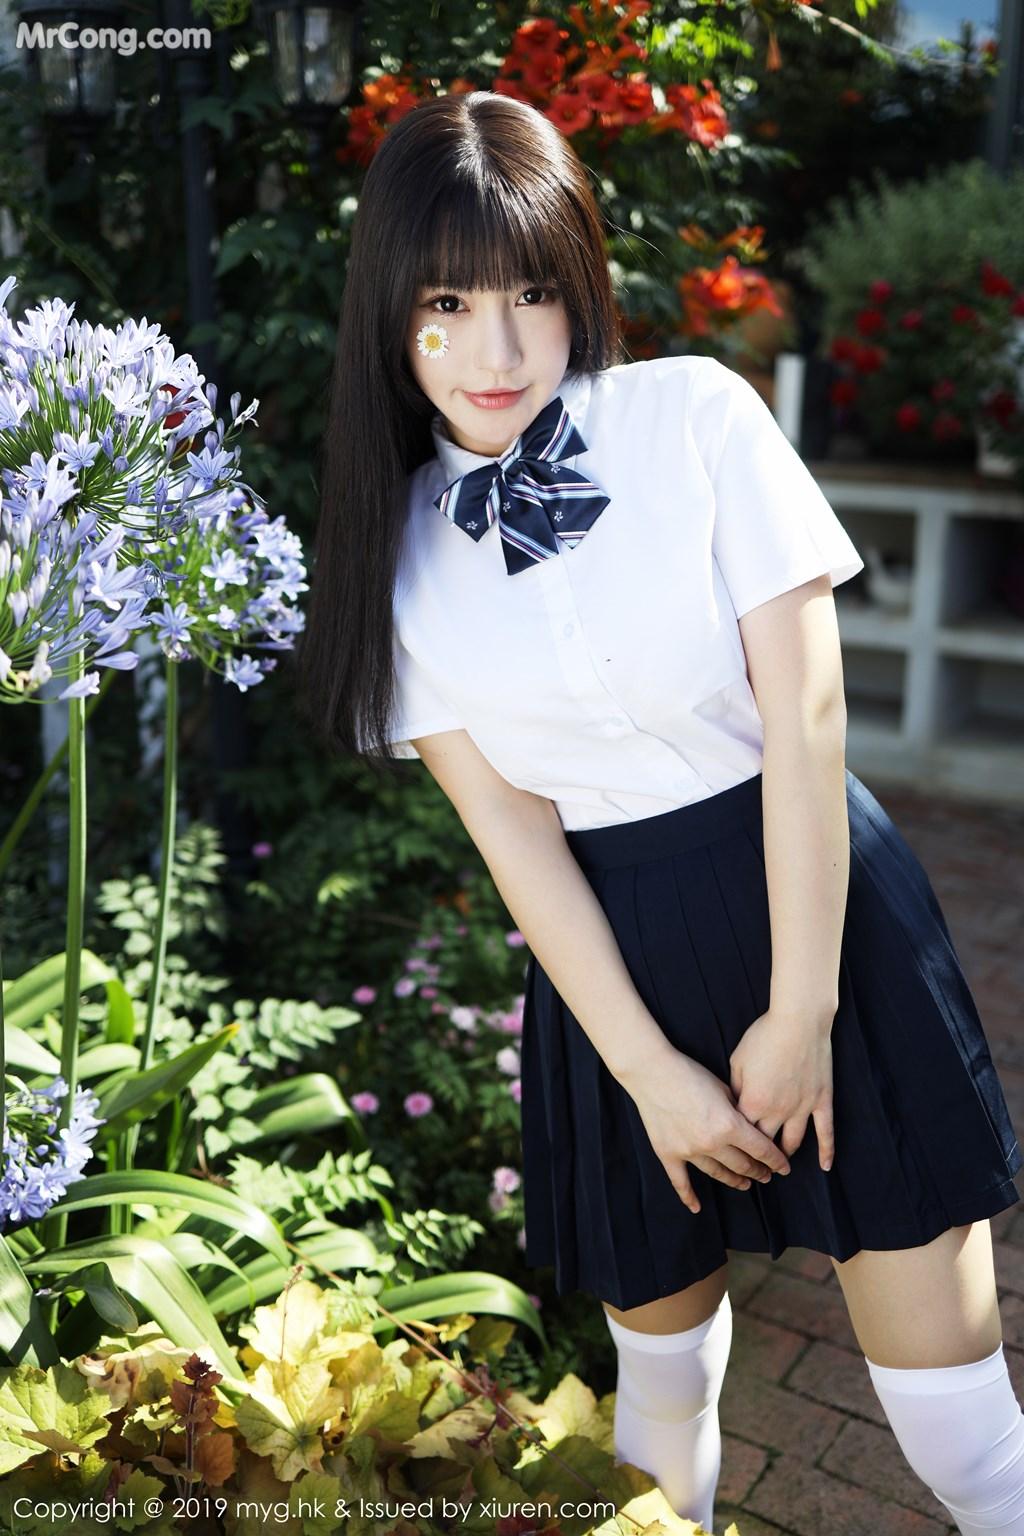 MyGirl Vol.394: Zhu Ke Er (Flower 朱 可 儿) (55 pictures)